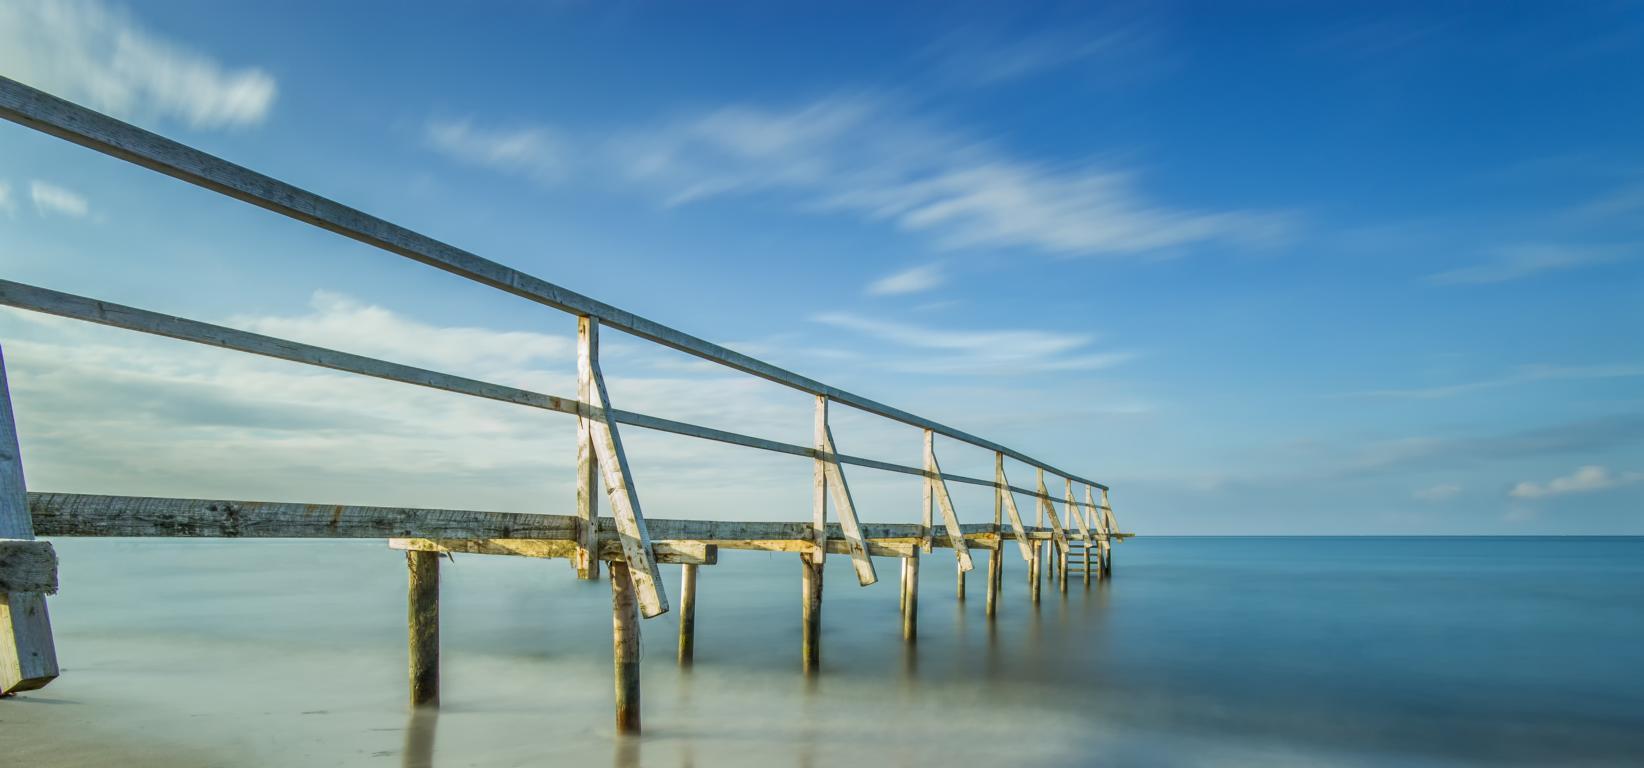 Brücke in den Horizont